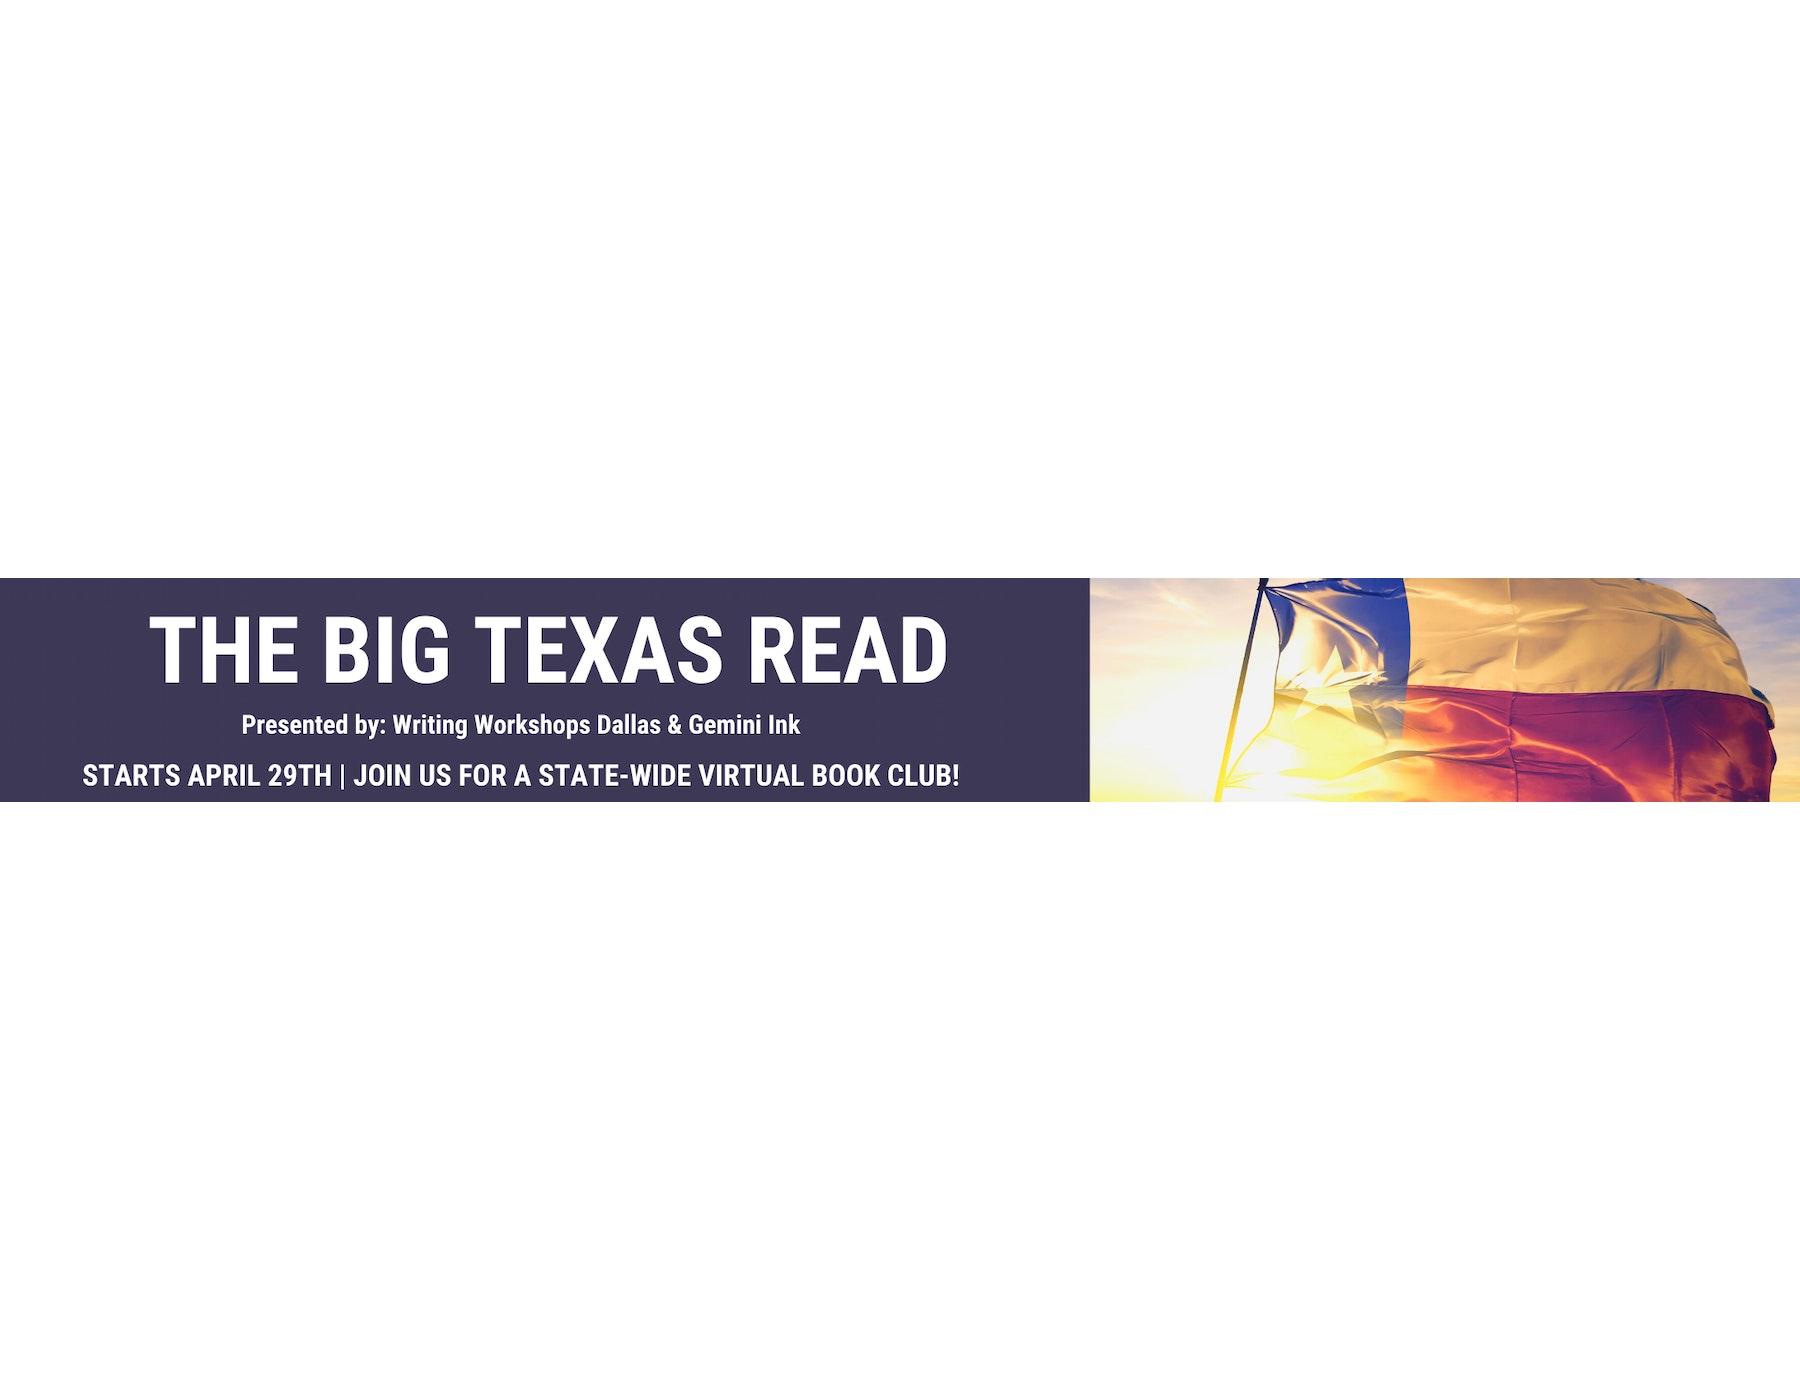 The Big Texas Read